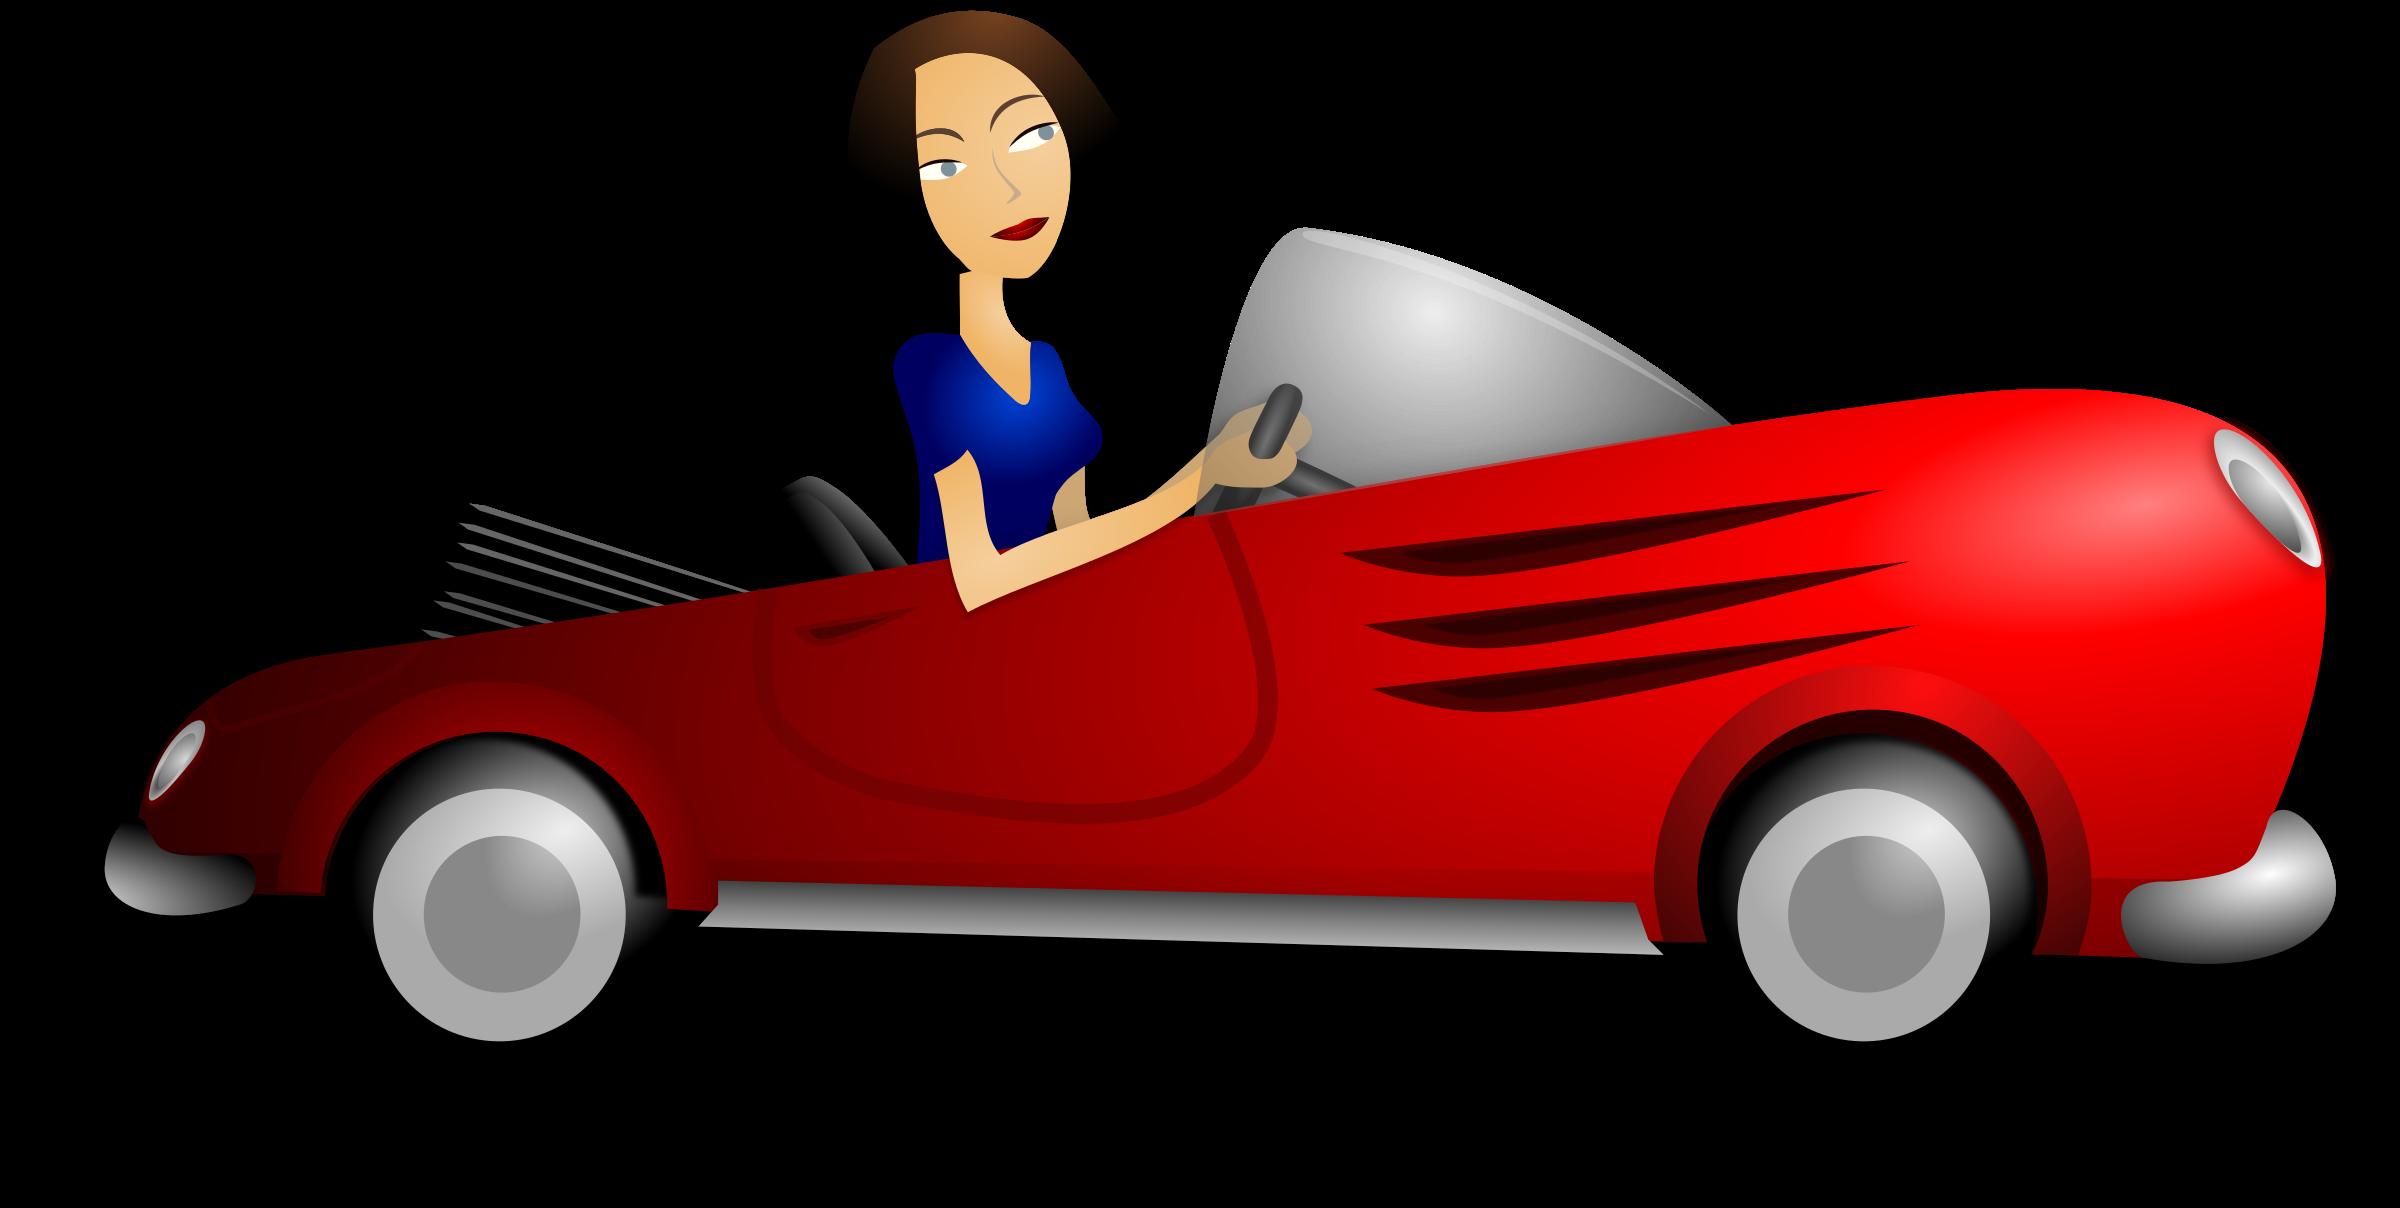 Car insurance clipart svg library stock Clipart - Brunette Female Driver svg library stock